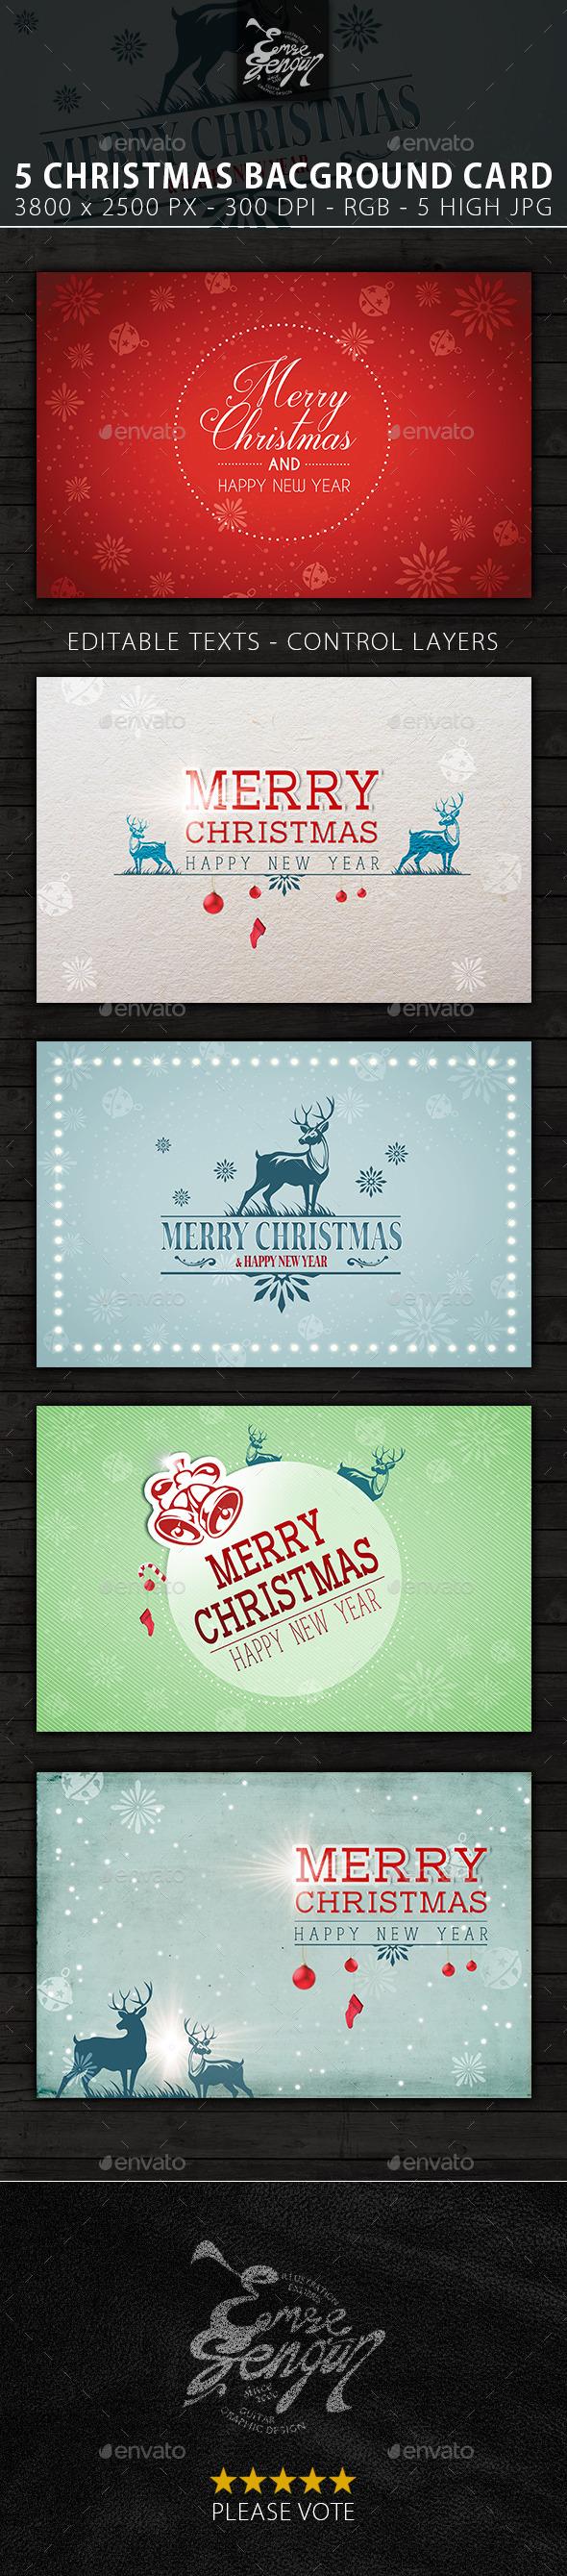 Merry Christmas Card u0026 Backgrounds Vol.2